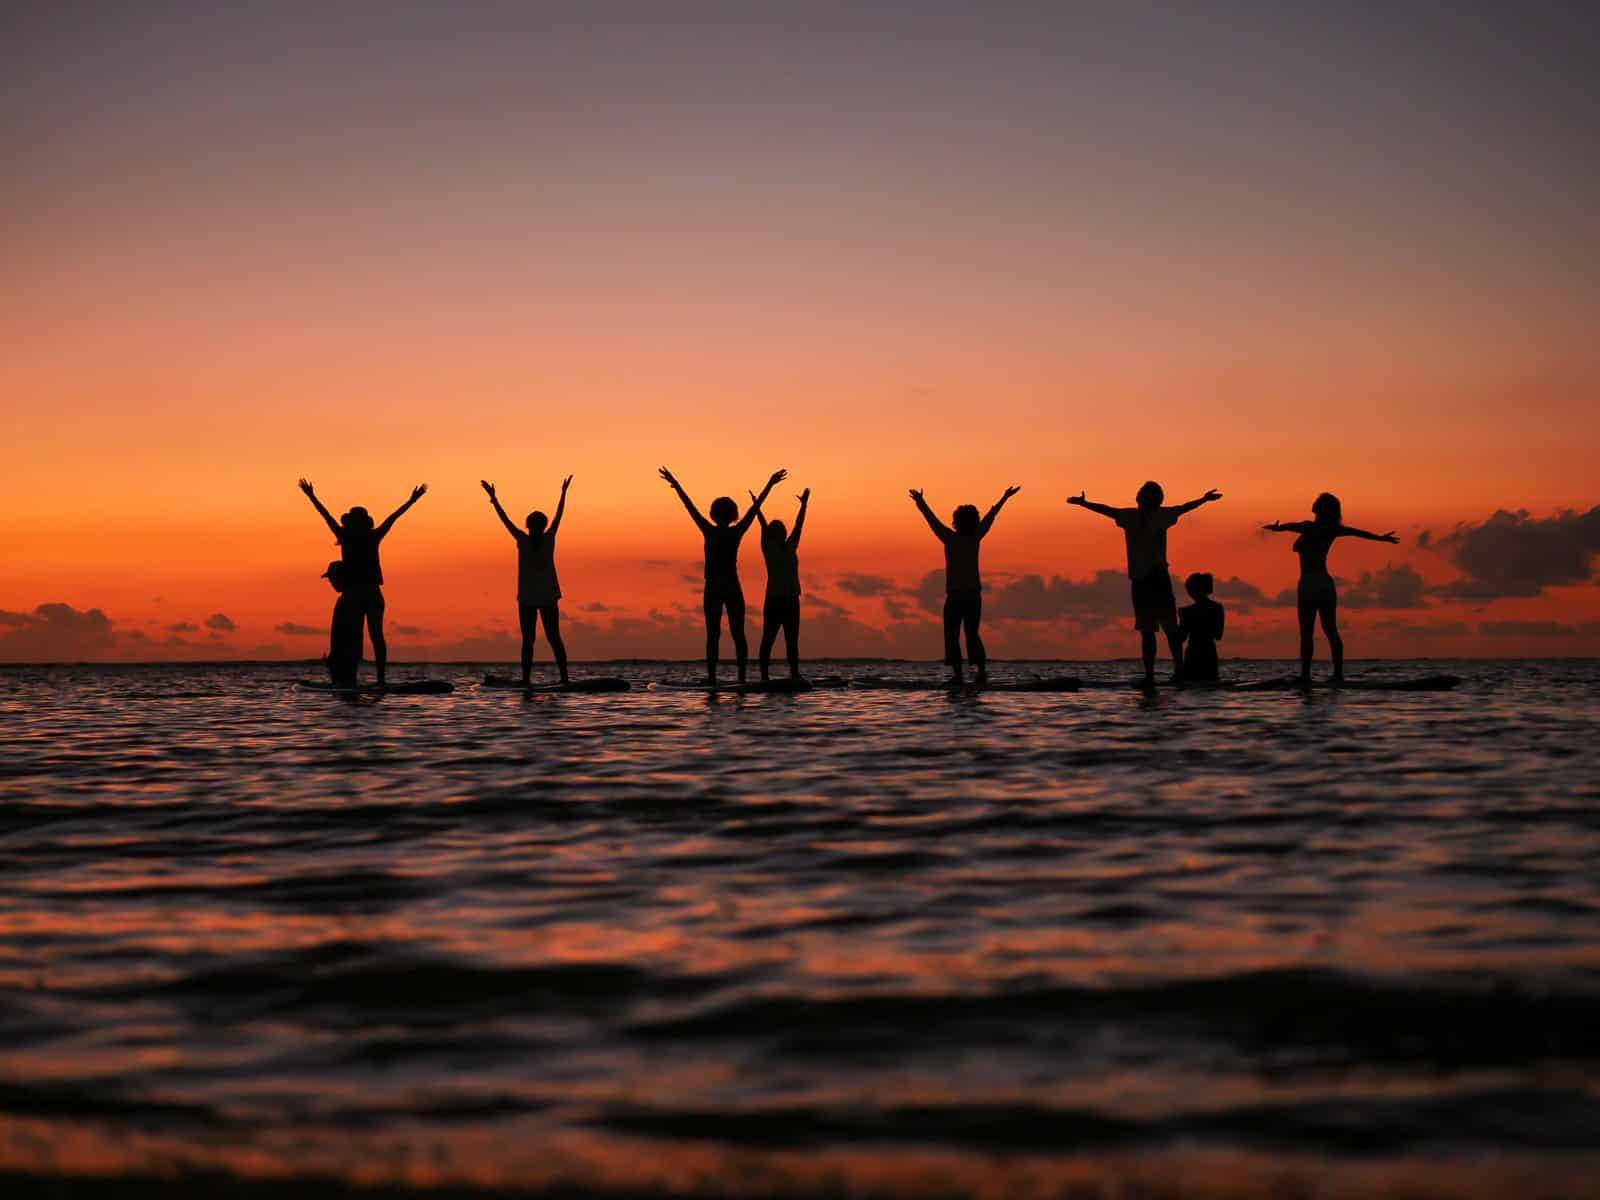 SUP Yoga Loissin Sunset